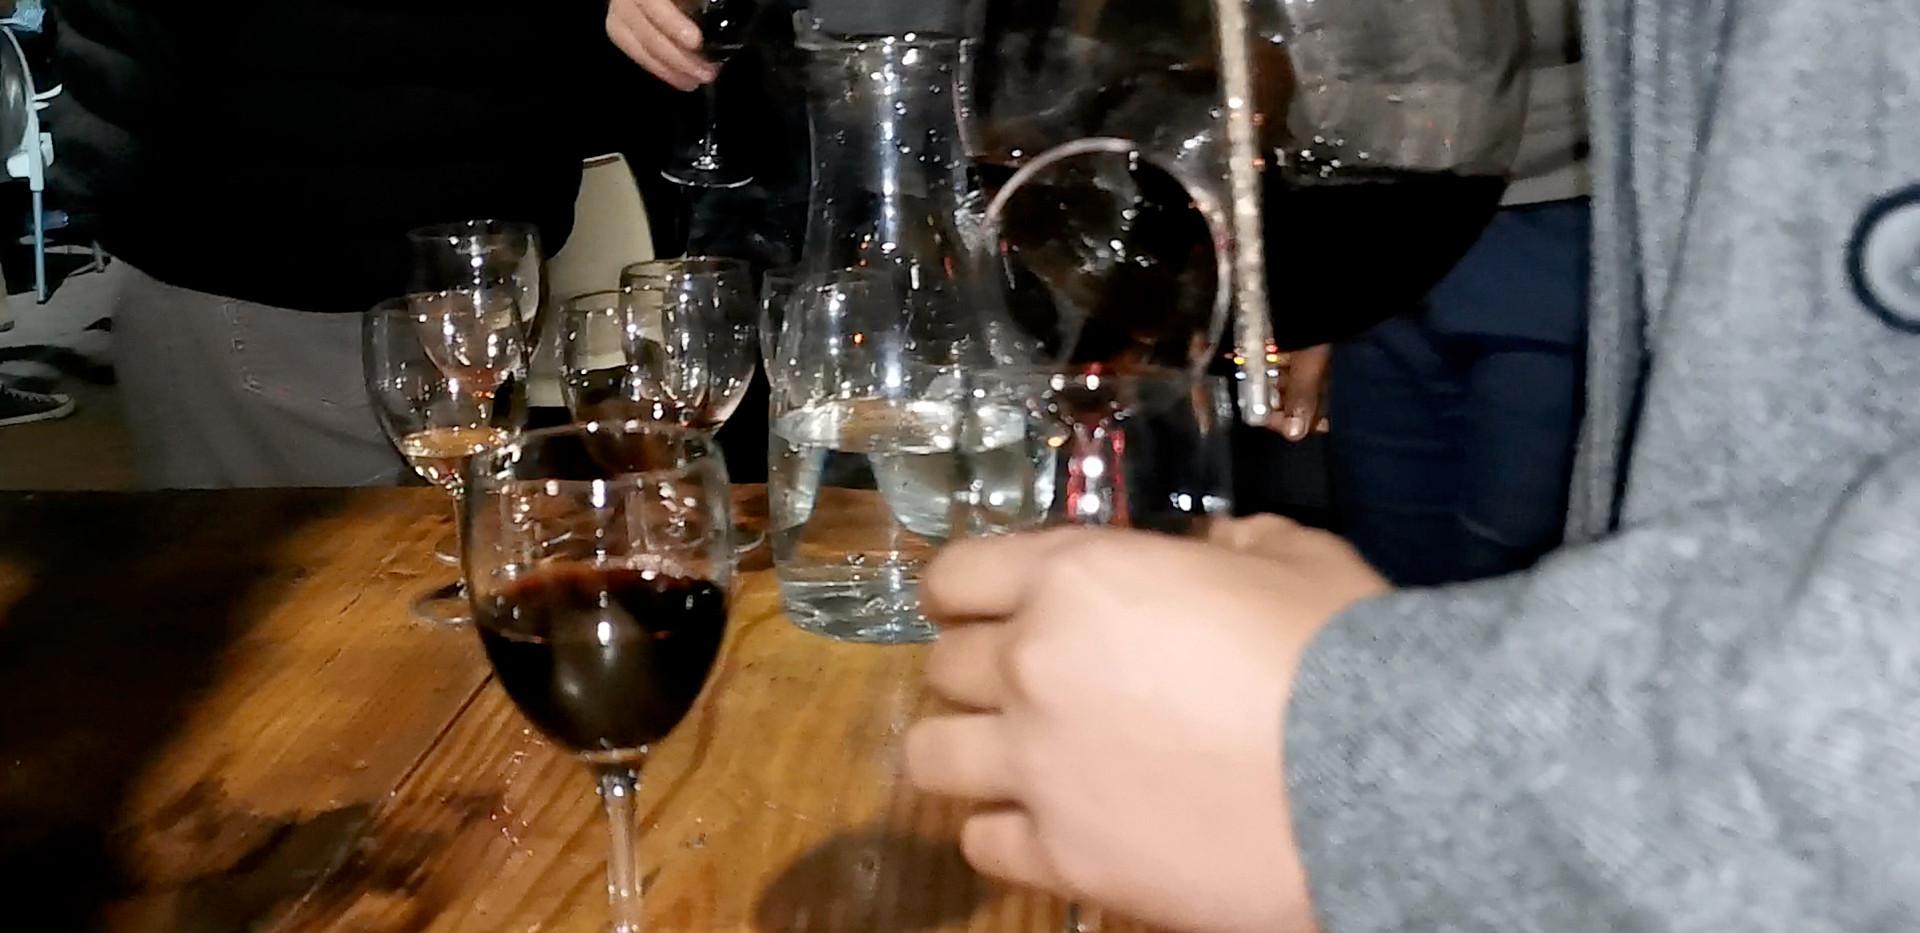 Liz Ogumbo Wine Tasting Vodoo Lily 8 cop